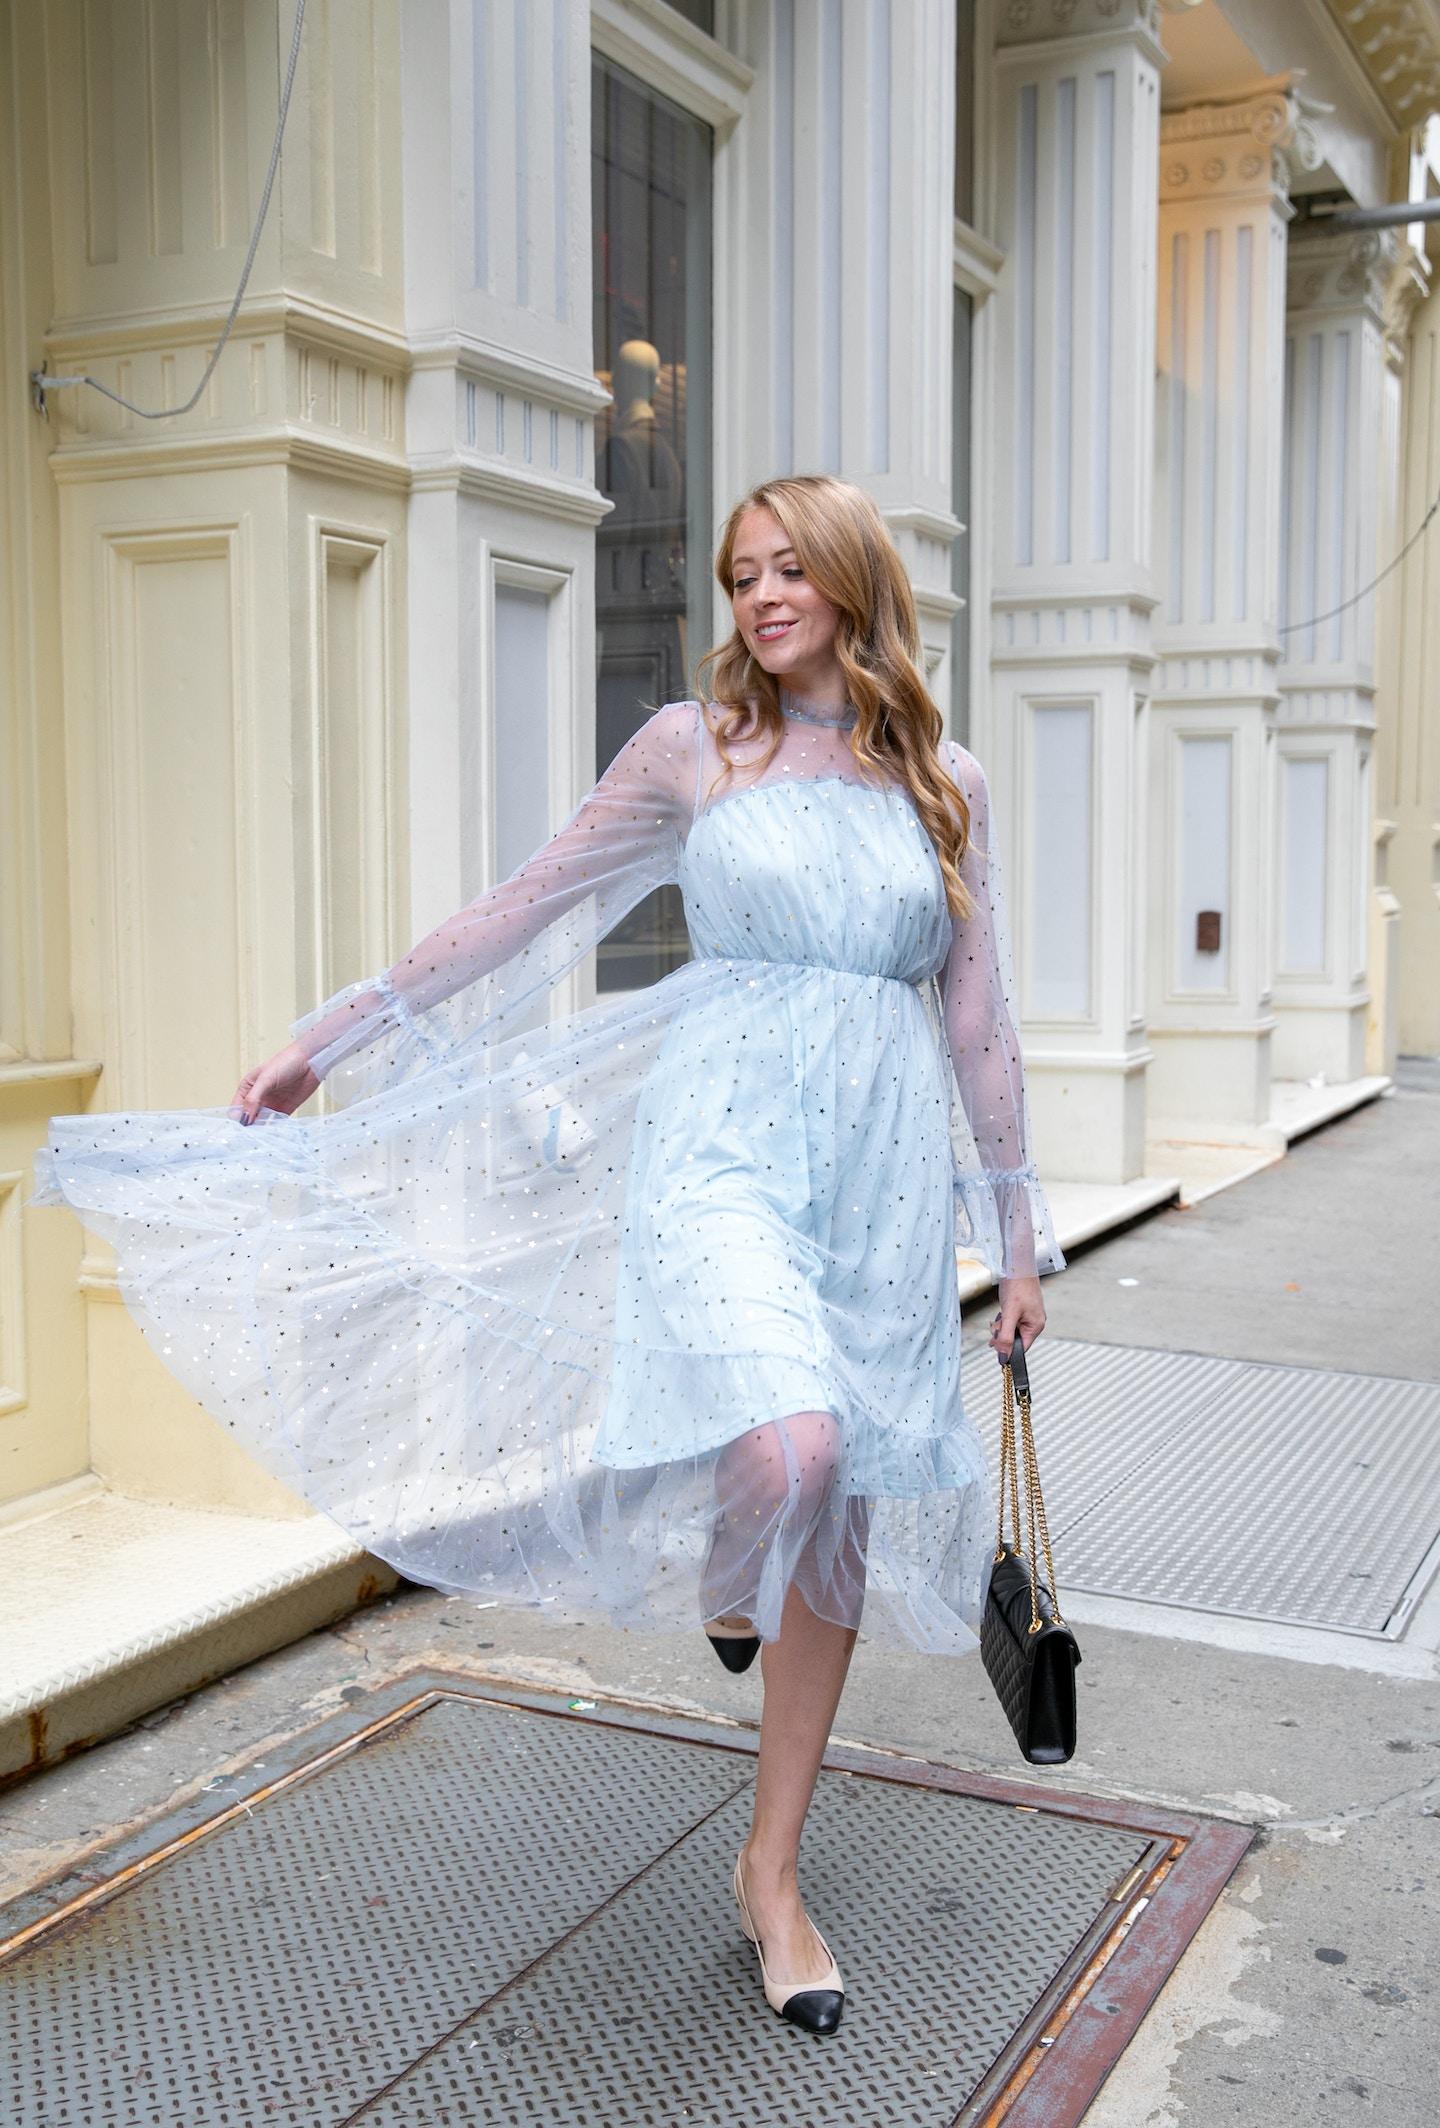 2020 New Year's Resolutions | SHEIN Tulle Star print dress, Sam Edelman Leah Cap Toe Pumps, Saint Laurent Medium Envelope Bag